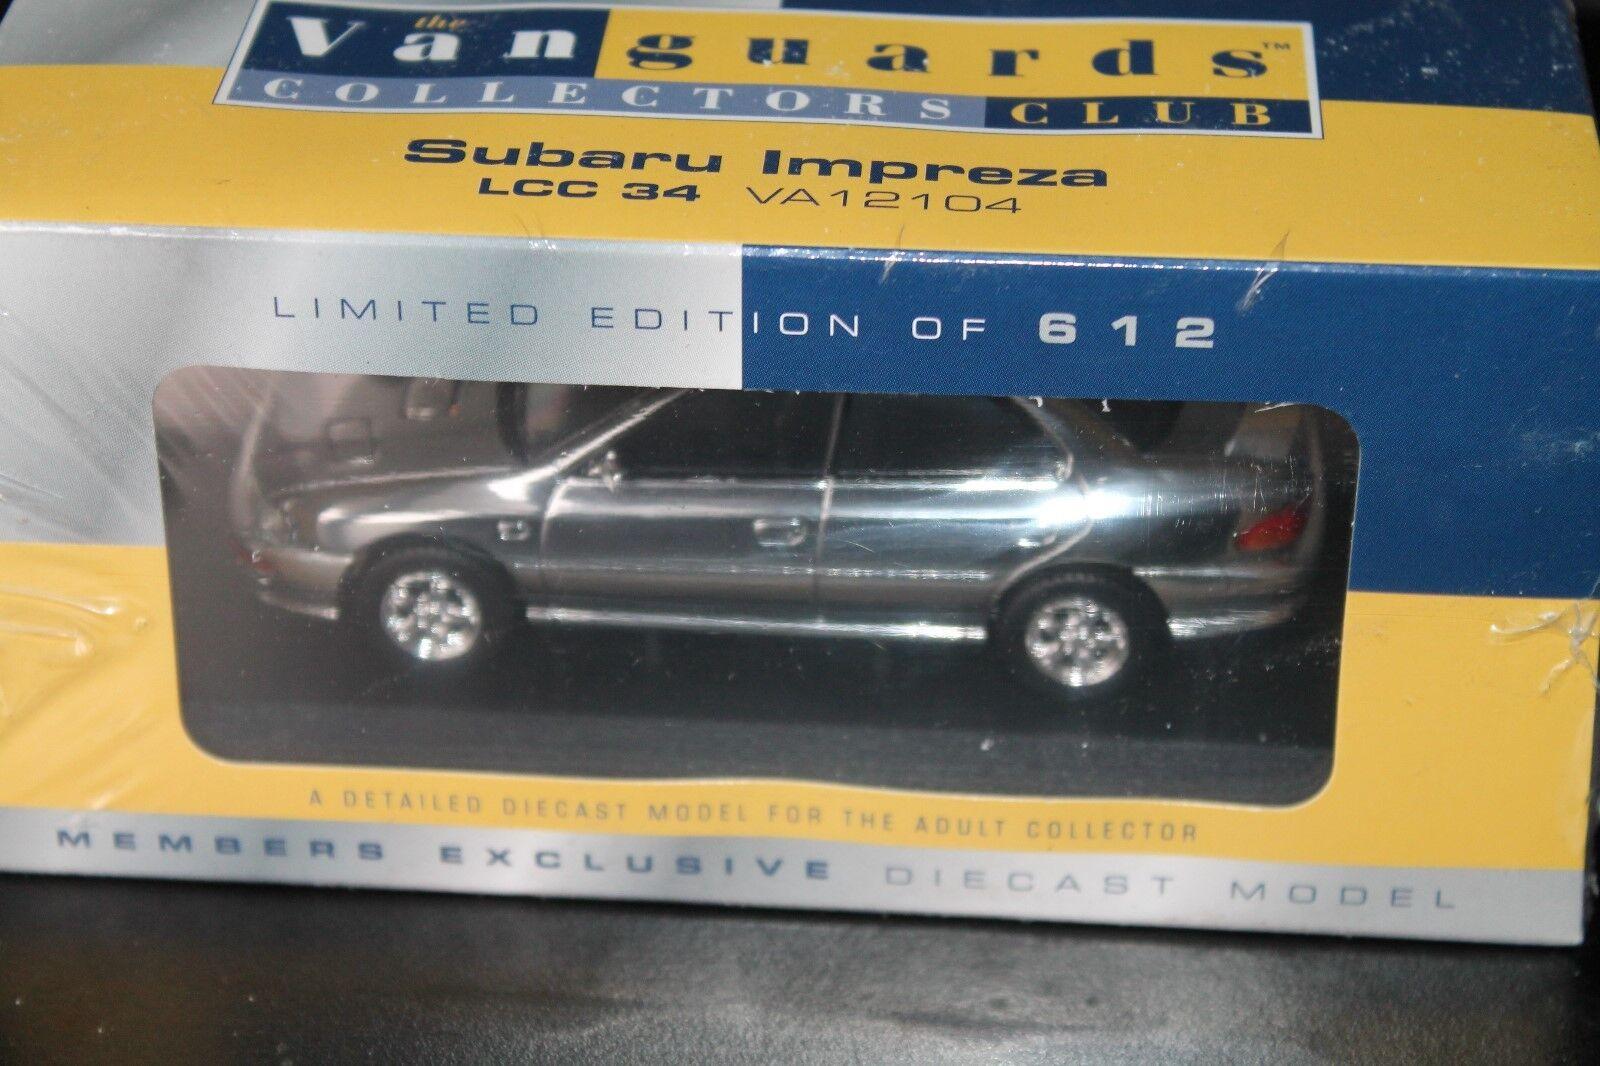 CORGI vanguards  subaru Impreza  1 43  OVP  chrome plated  Limited